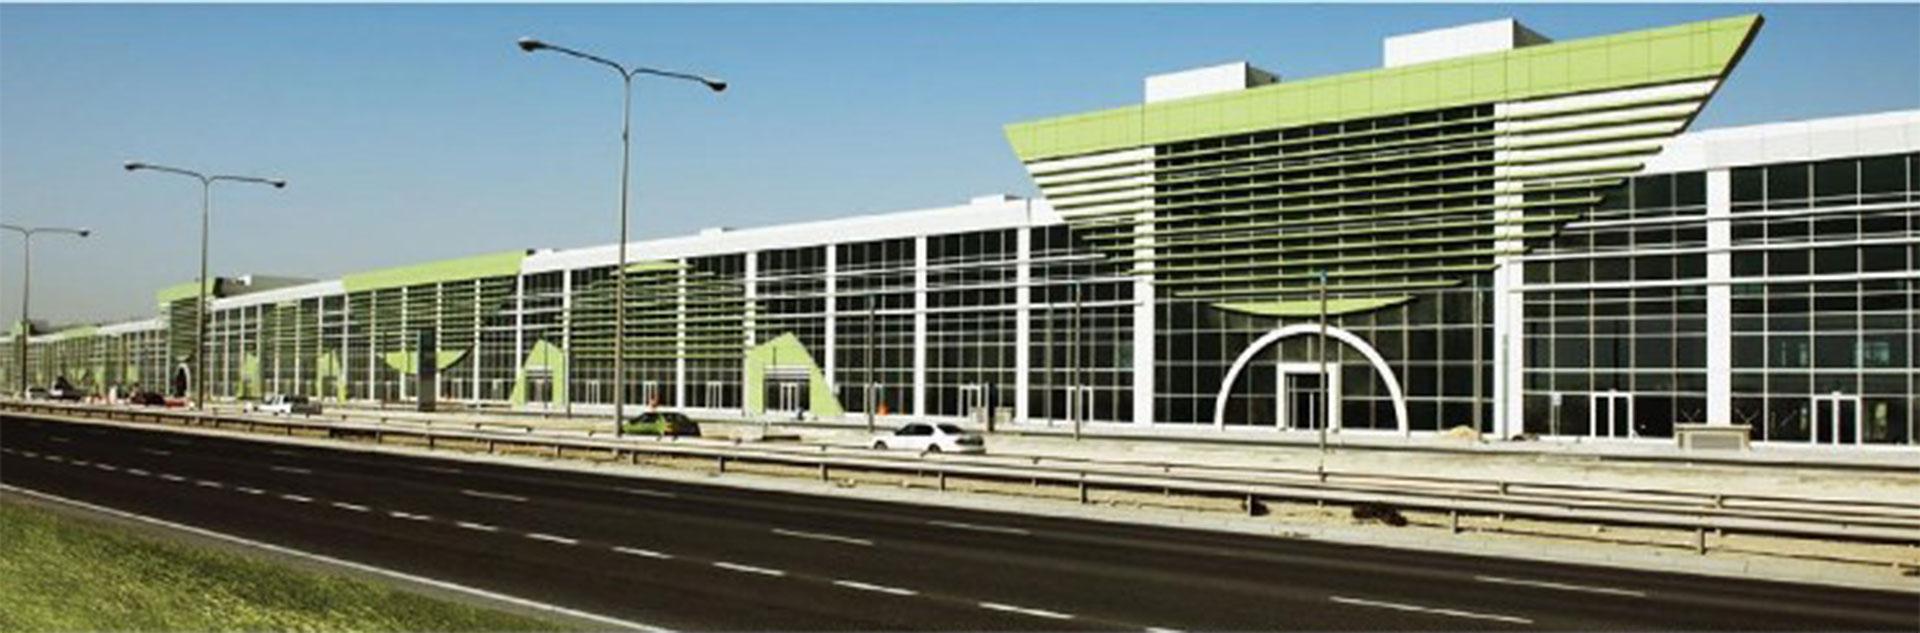 Techno Headquarter the leading system integrator in Qatar